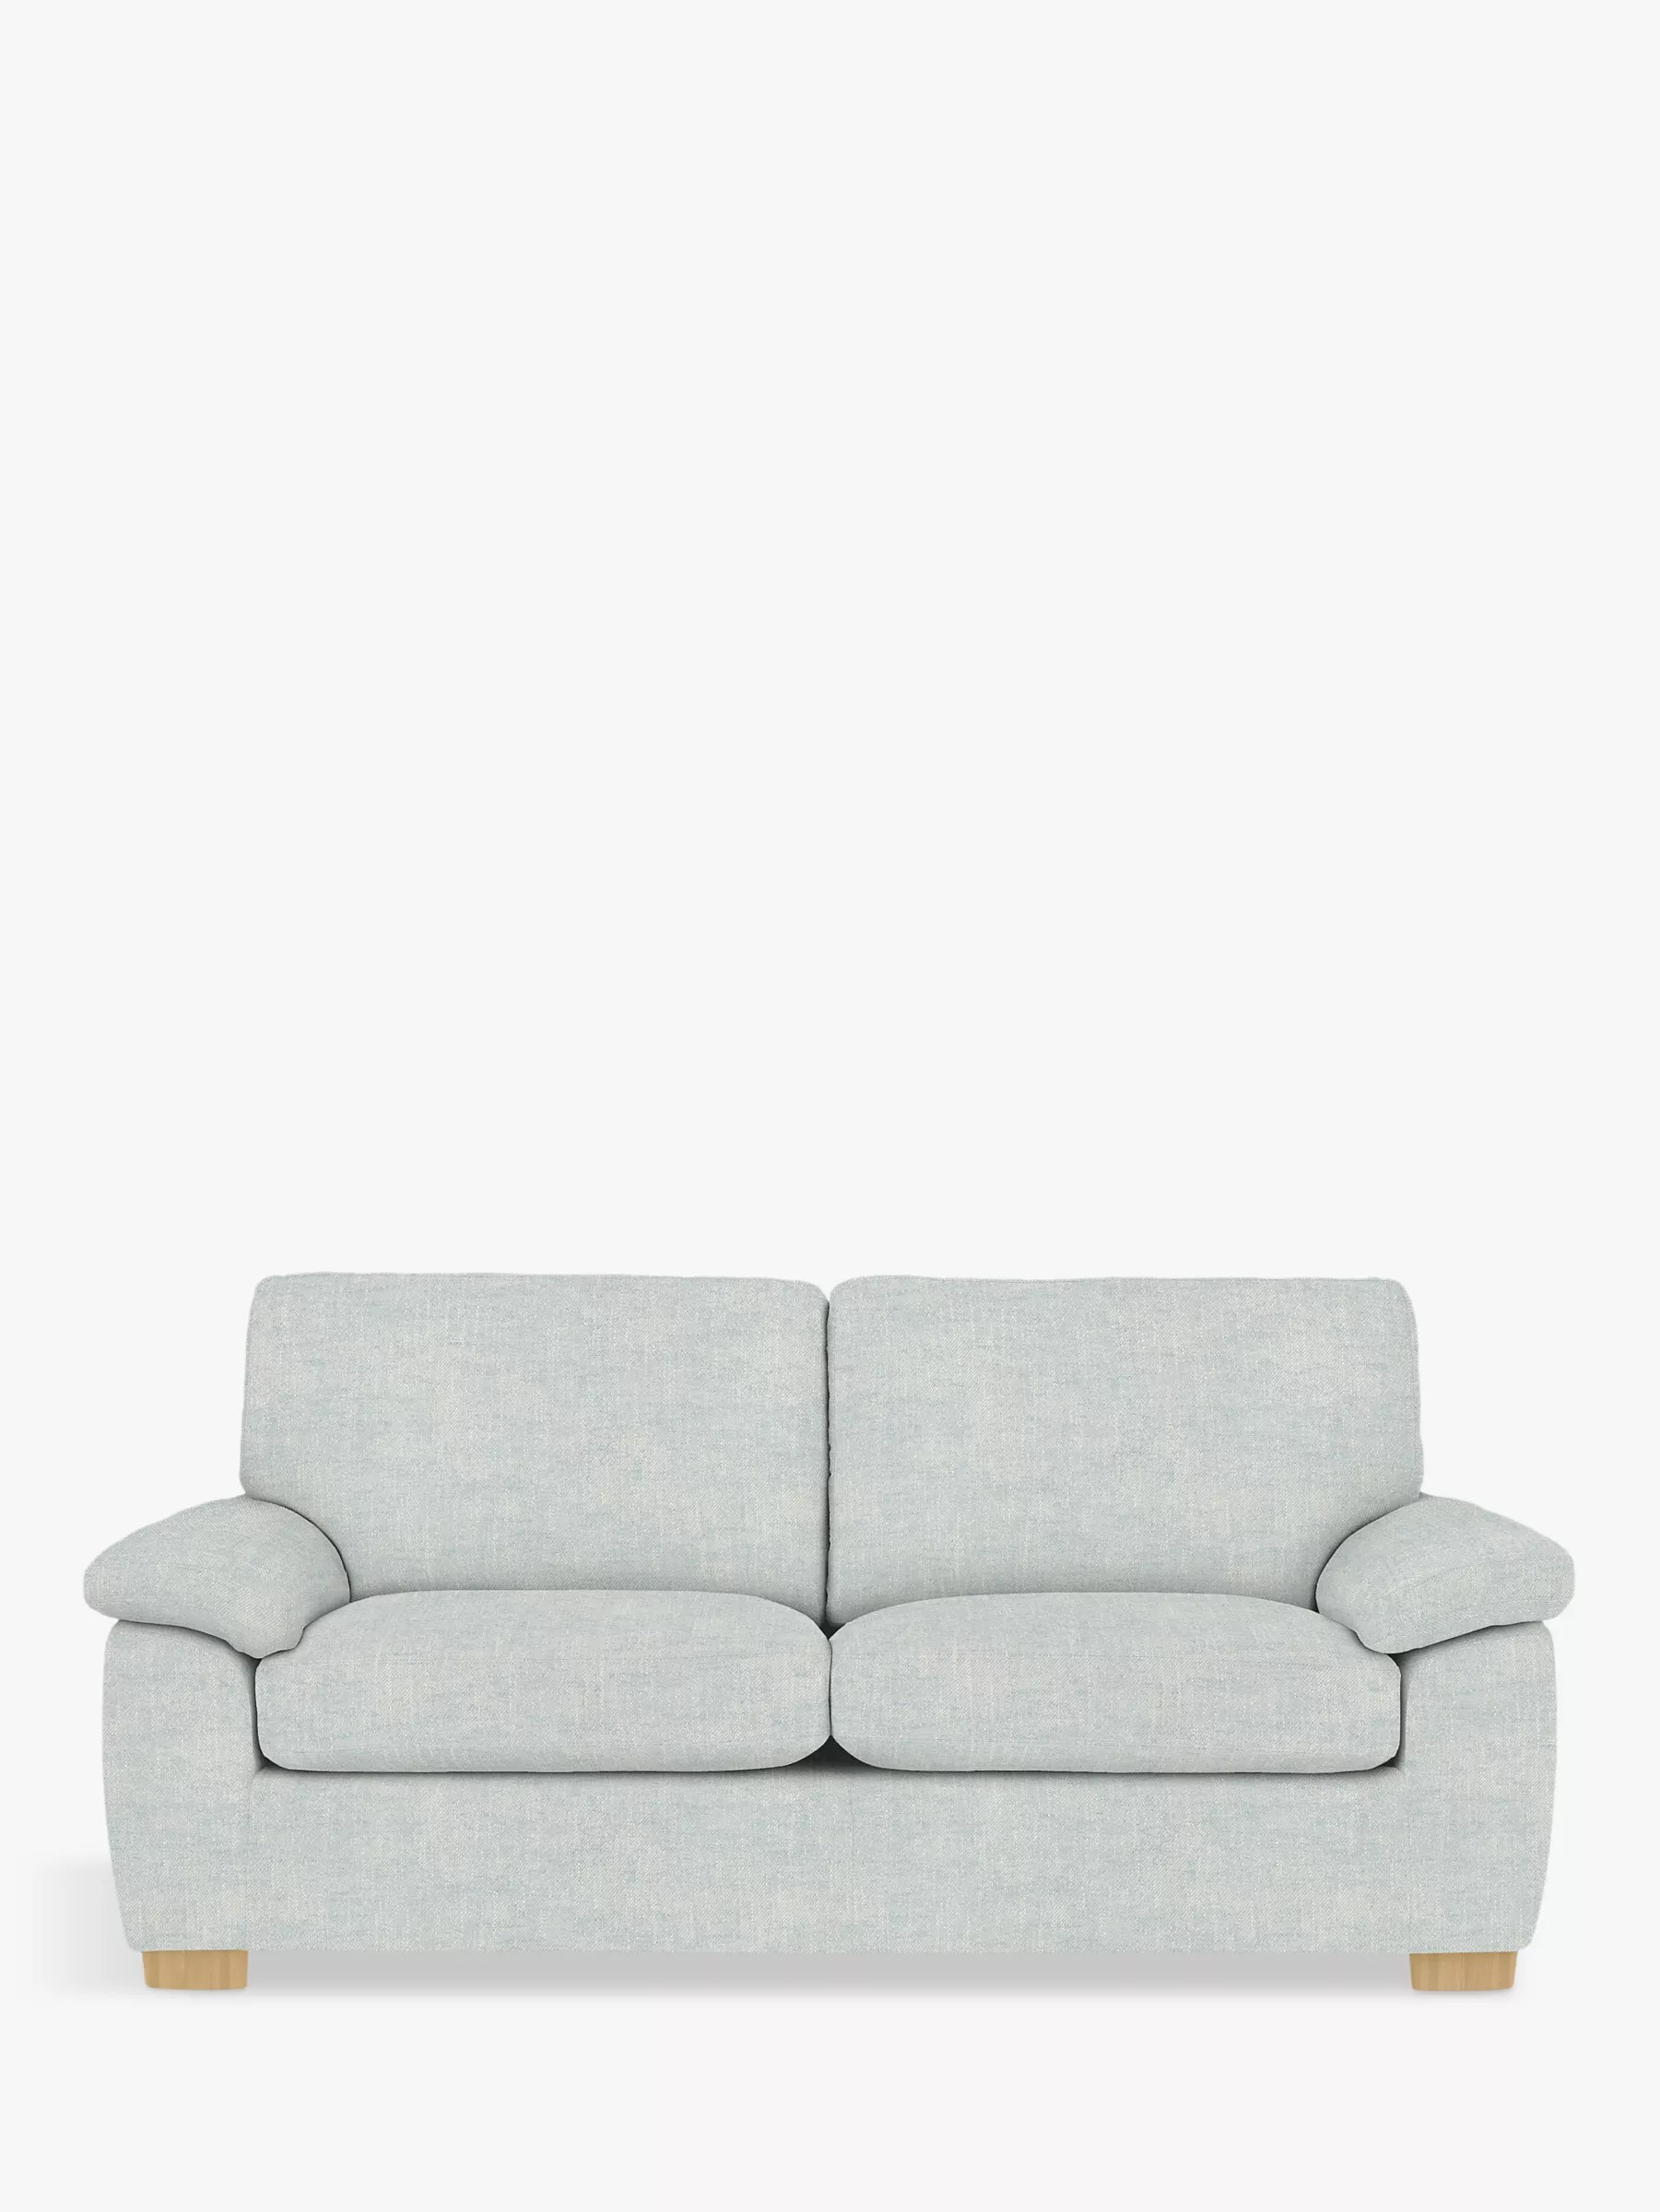 camden sofa john lewis best deals online uk and partners large 3 seater light